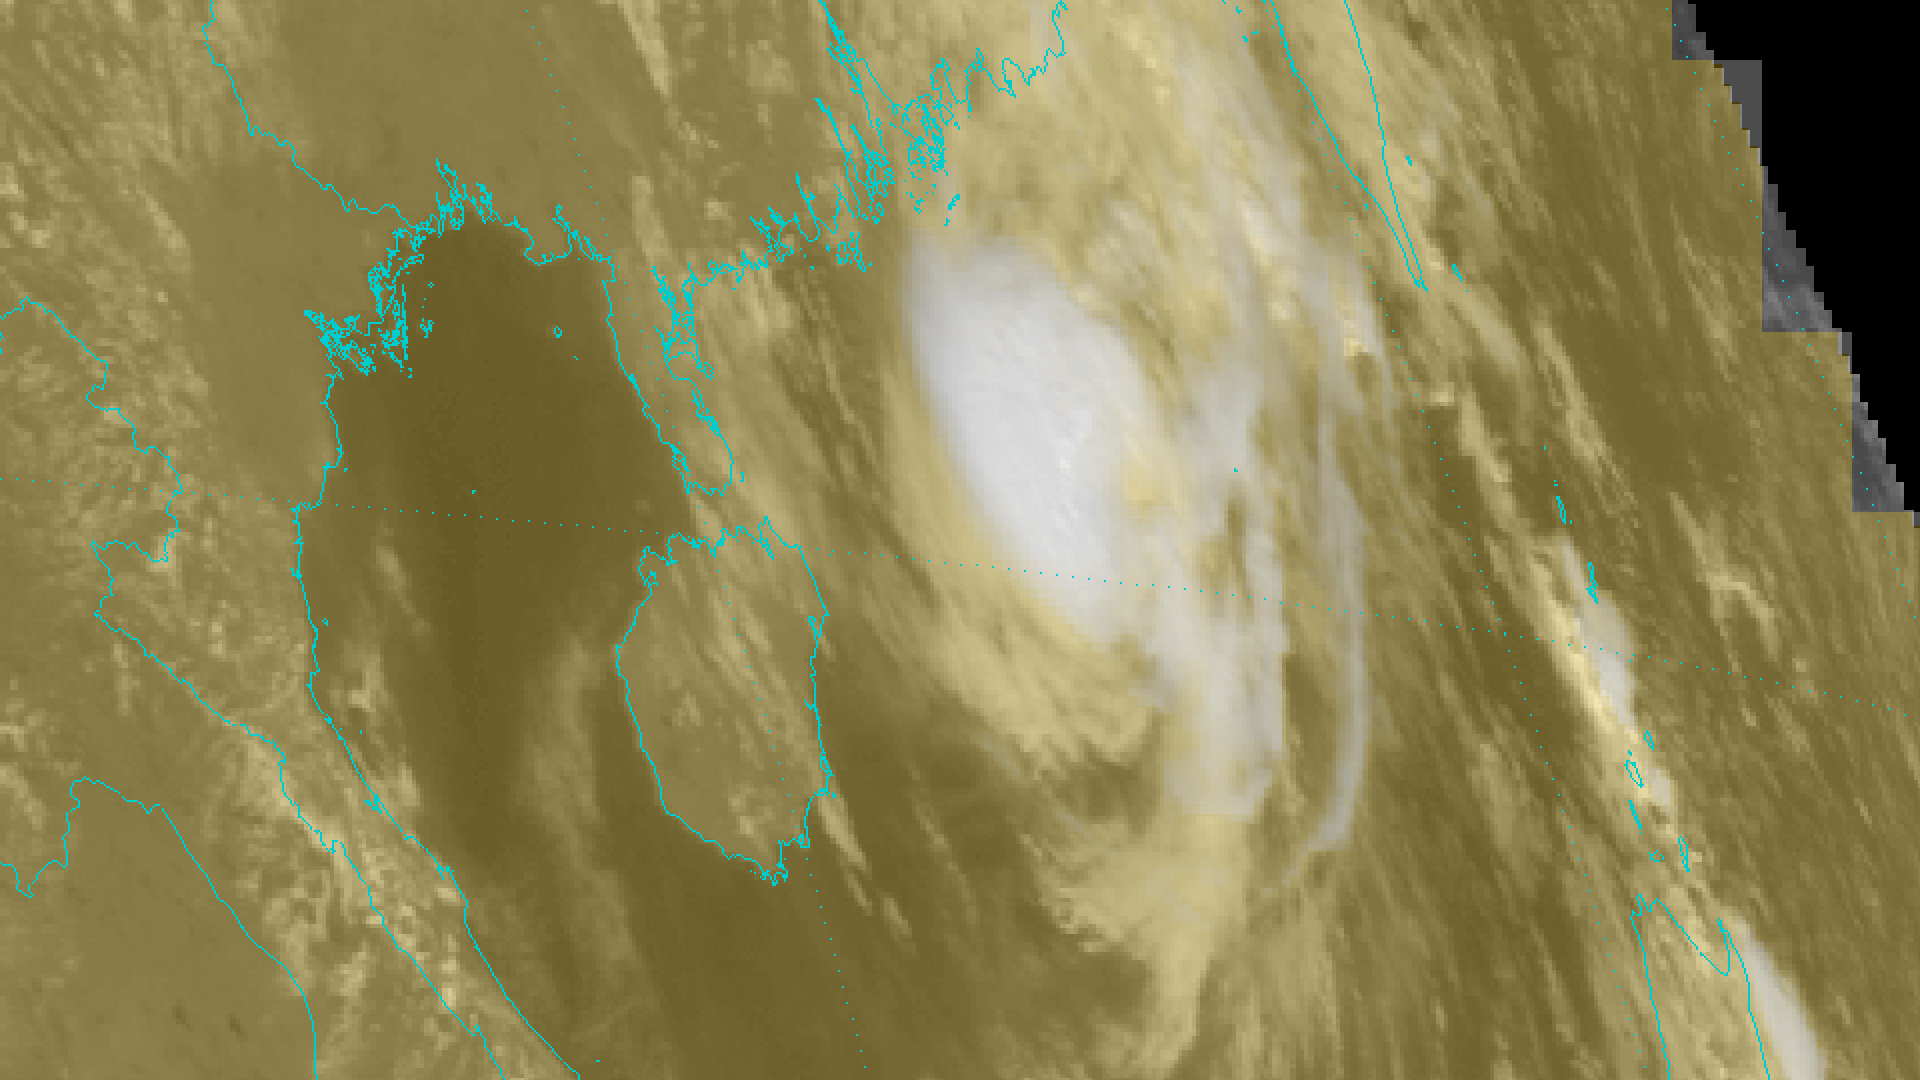 Typhoon Krosa over the South China Sea